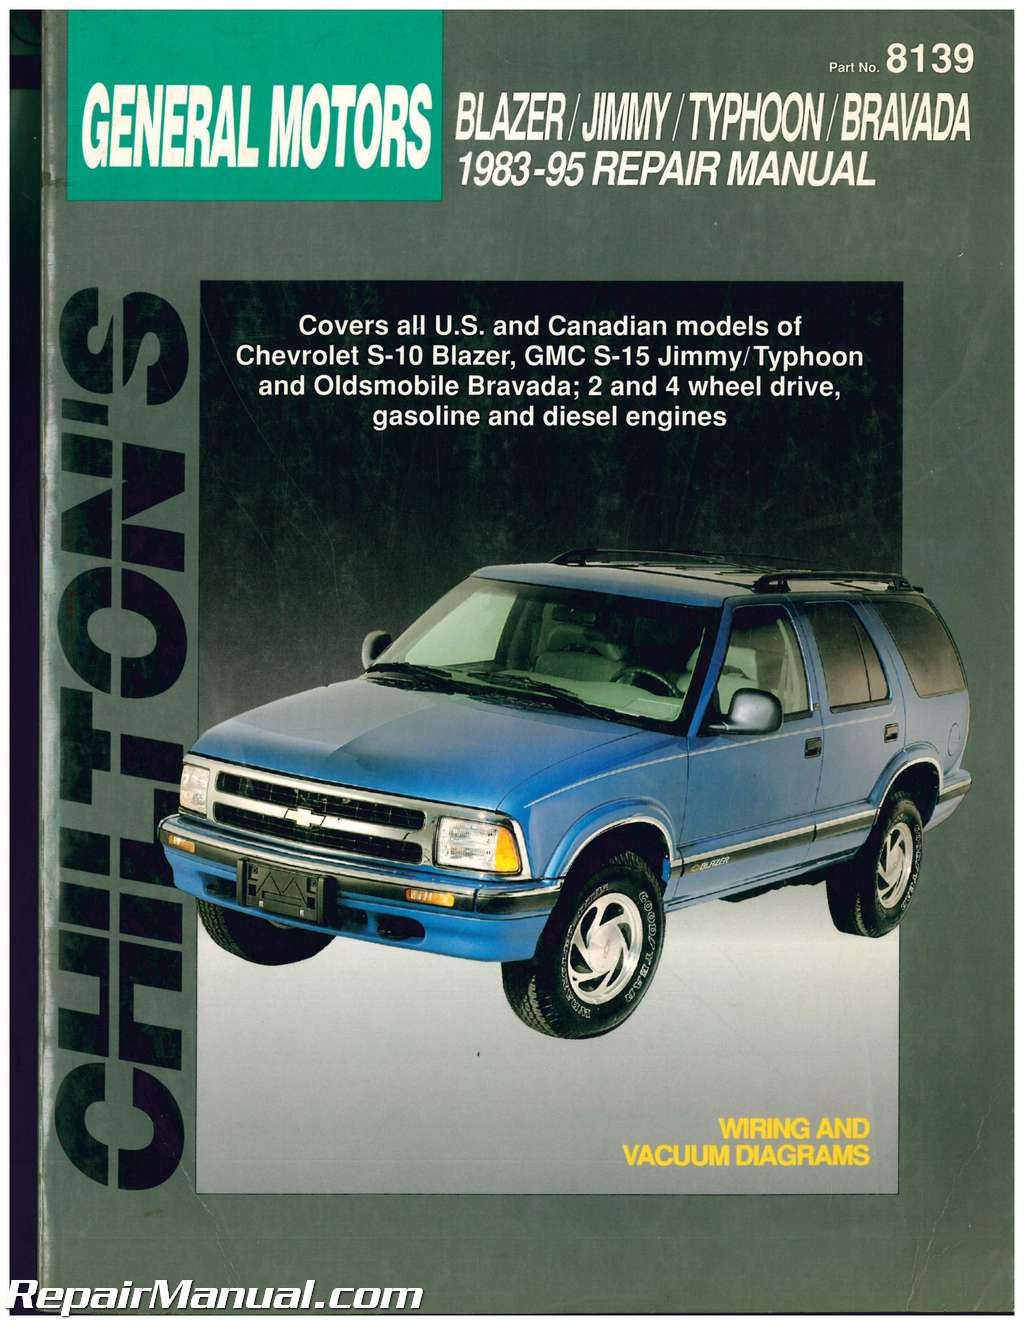 1983 s10 blazer owners manual